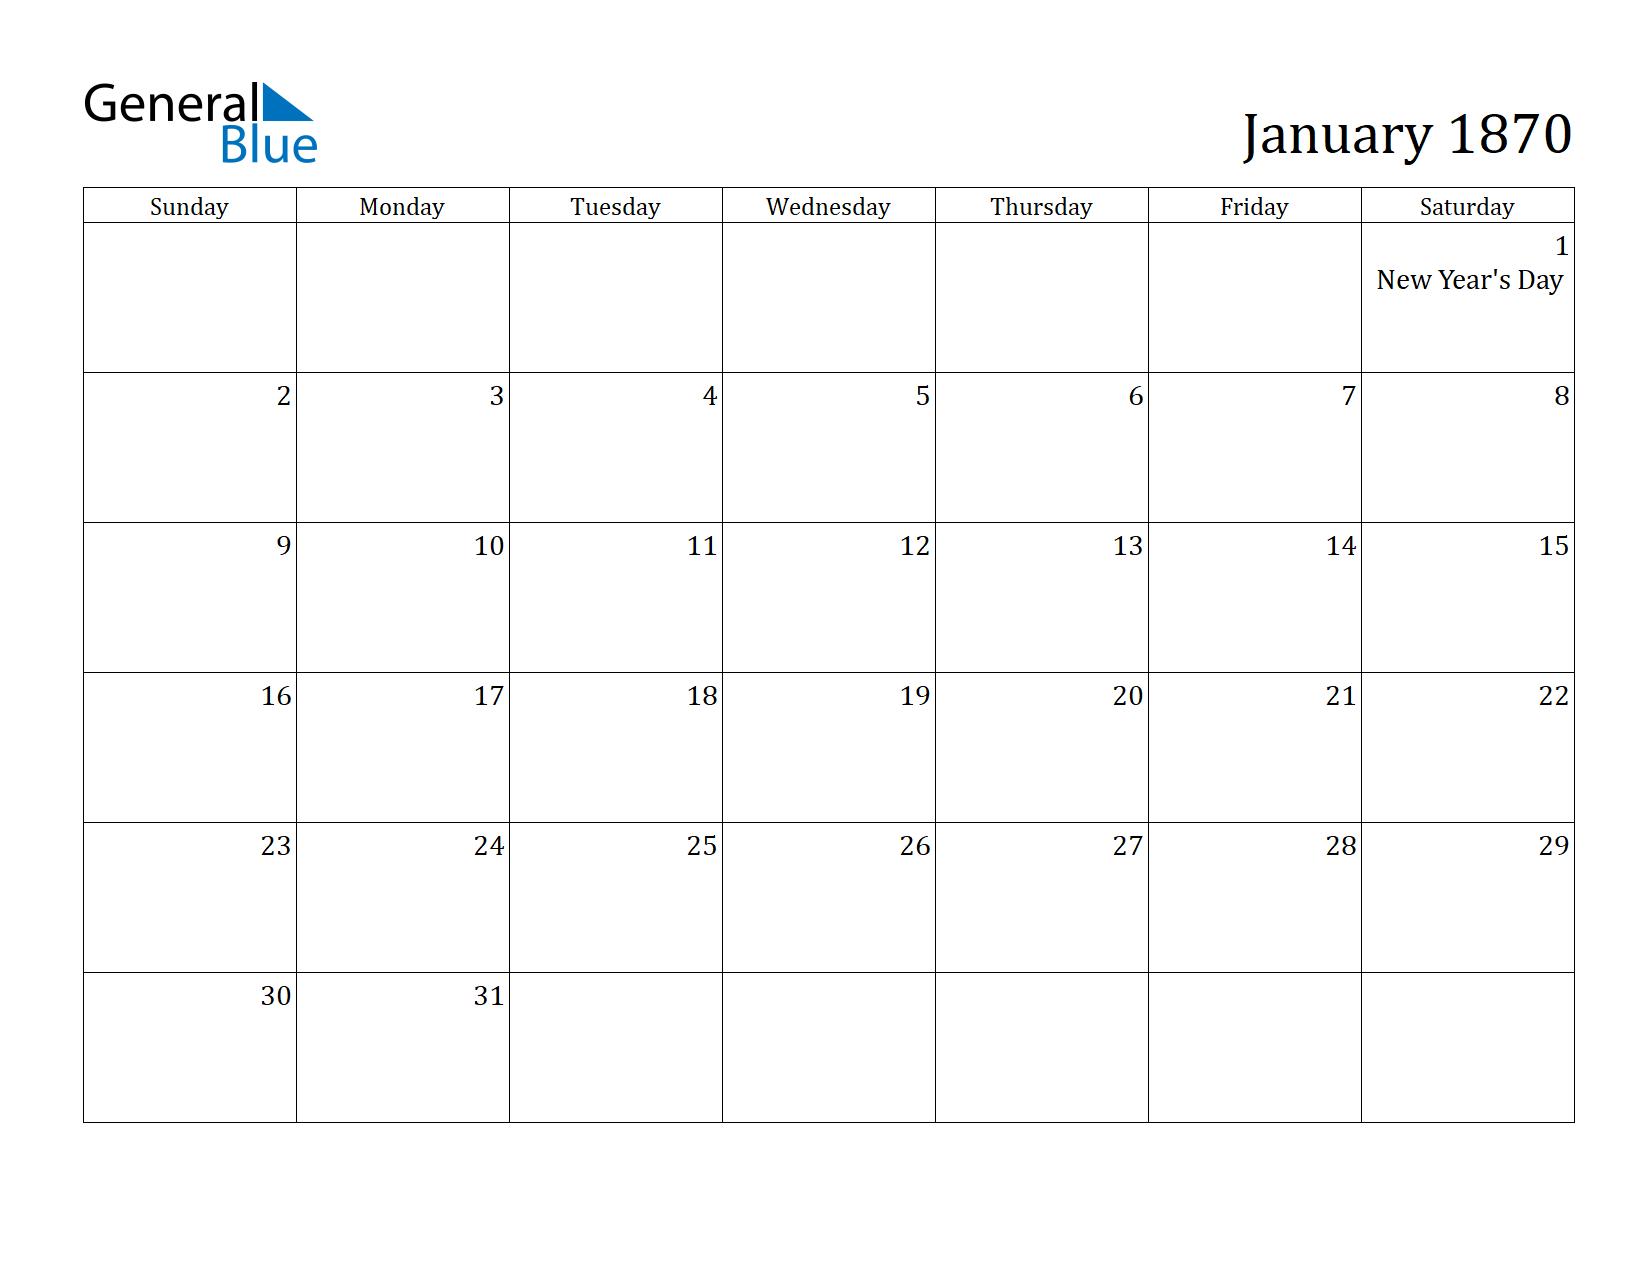 Image of January 1870 Calendar